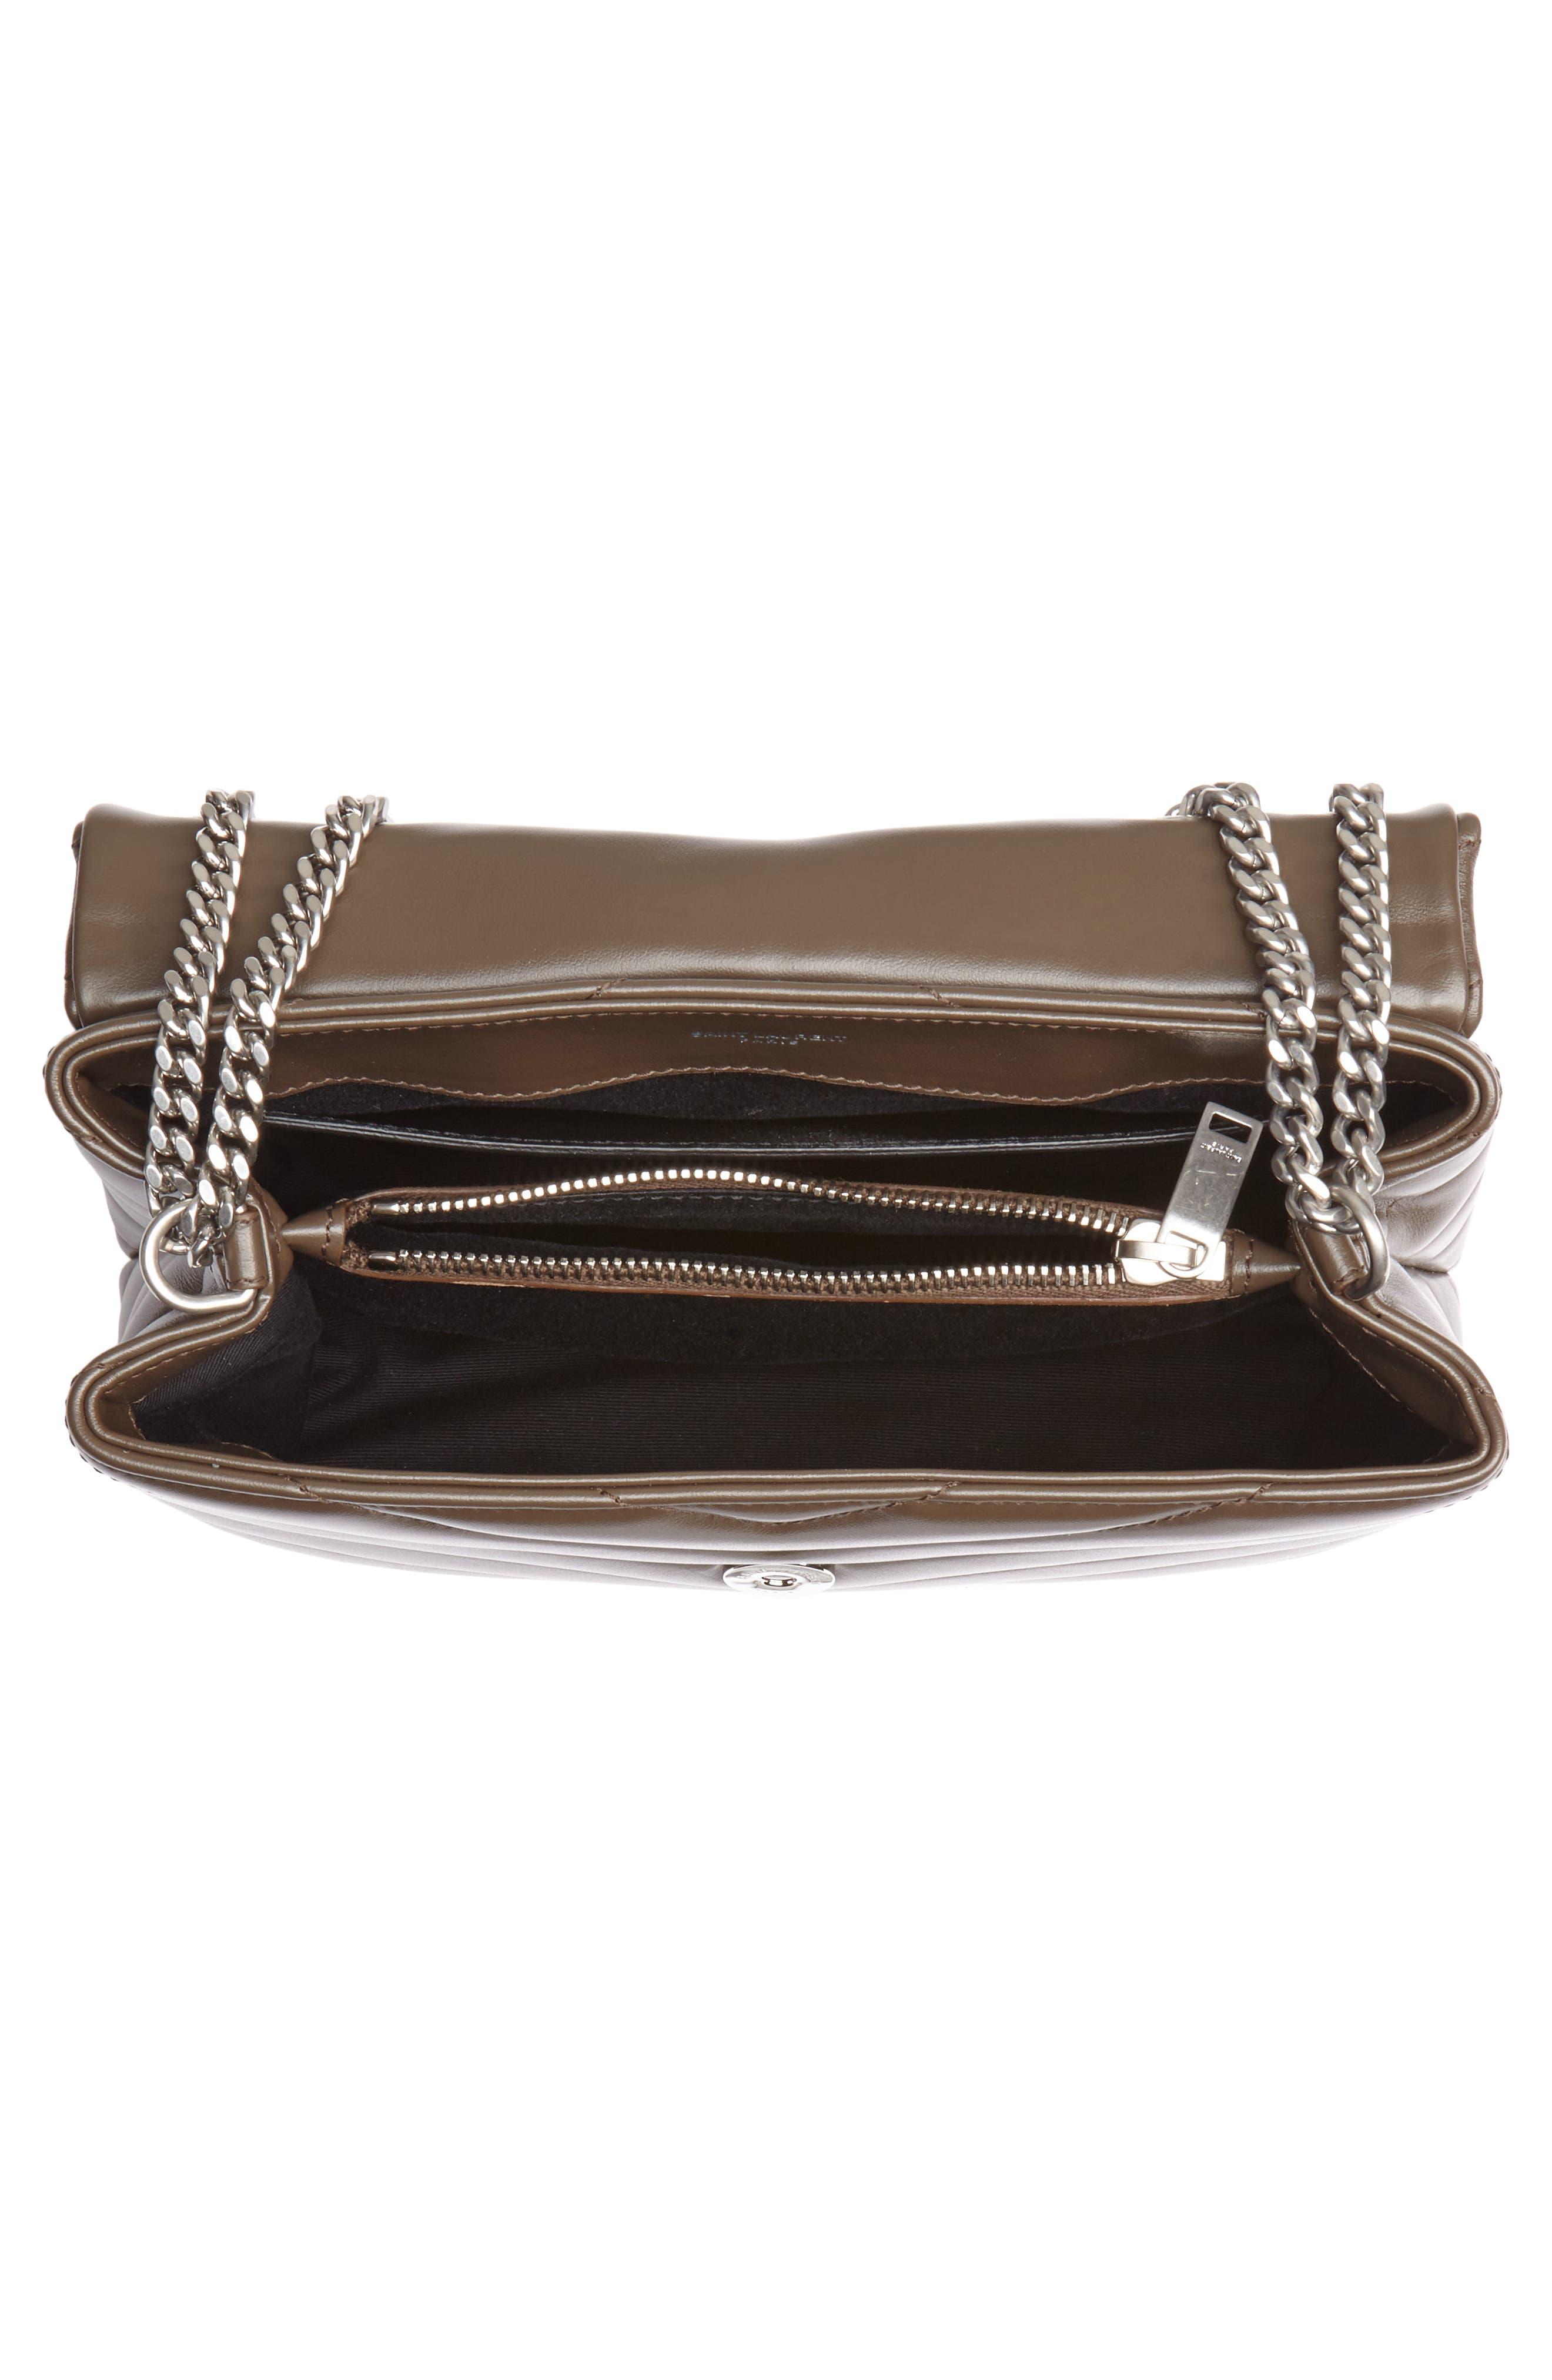 ,                             Small Loulou Matelassé Leather Shoulder Bag,                             Alternate thumbnail 4, color,                             FAGGIO/ FAGGIO